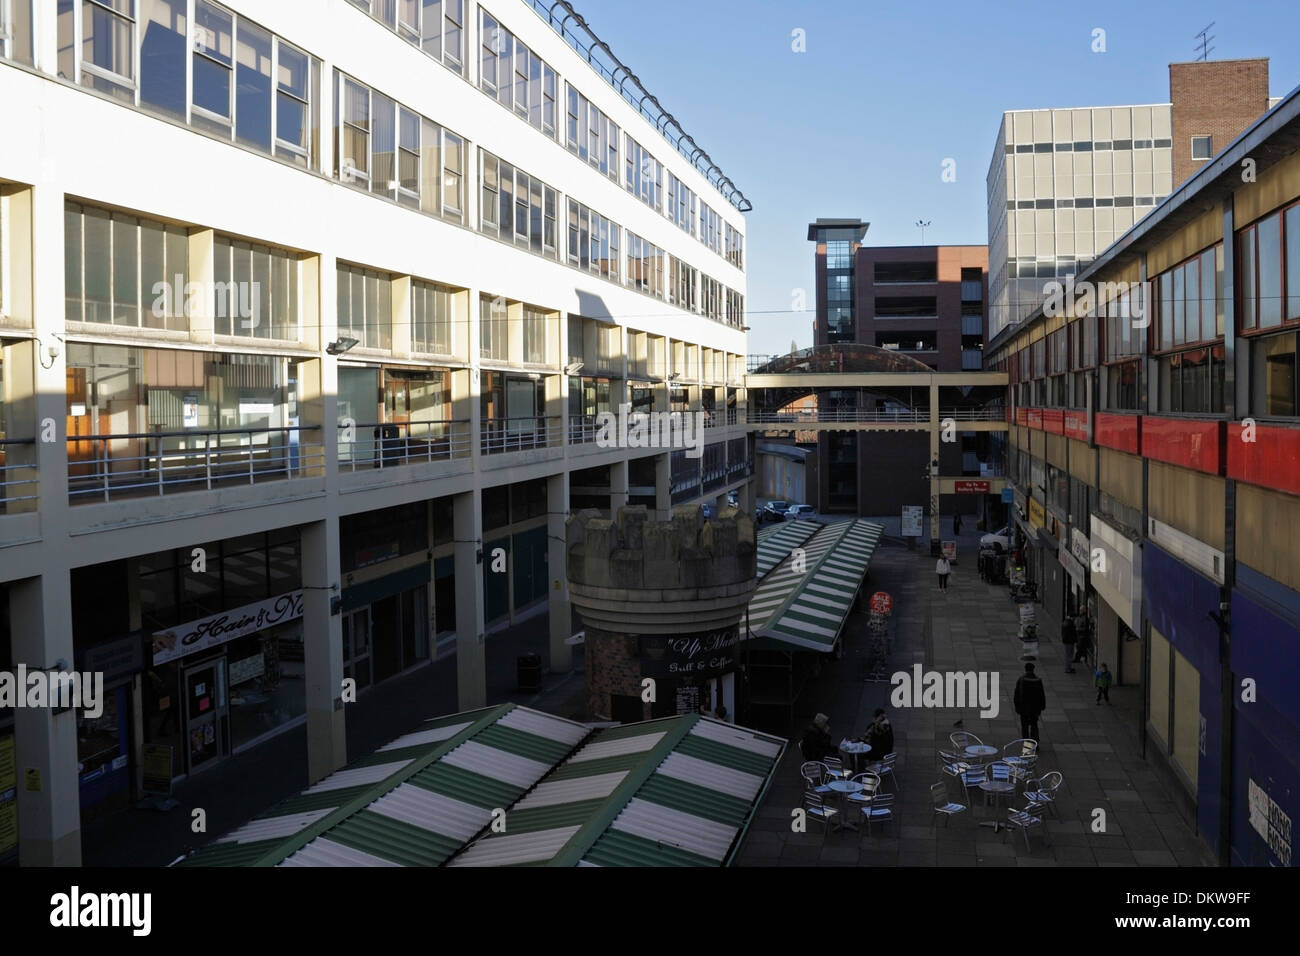 Exchange Street, Haymarket in Sheffield looking run down, now demolished - Stock Image